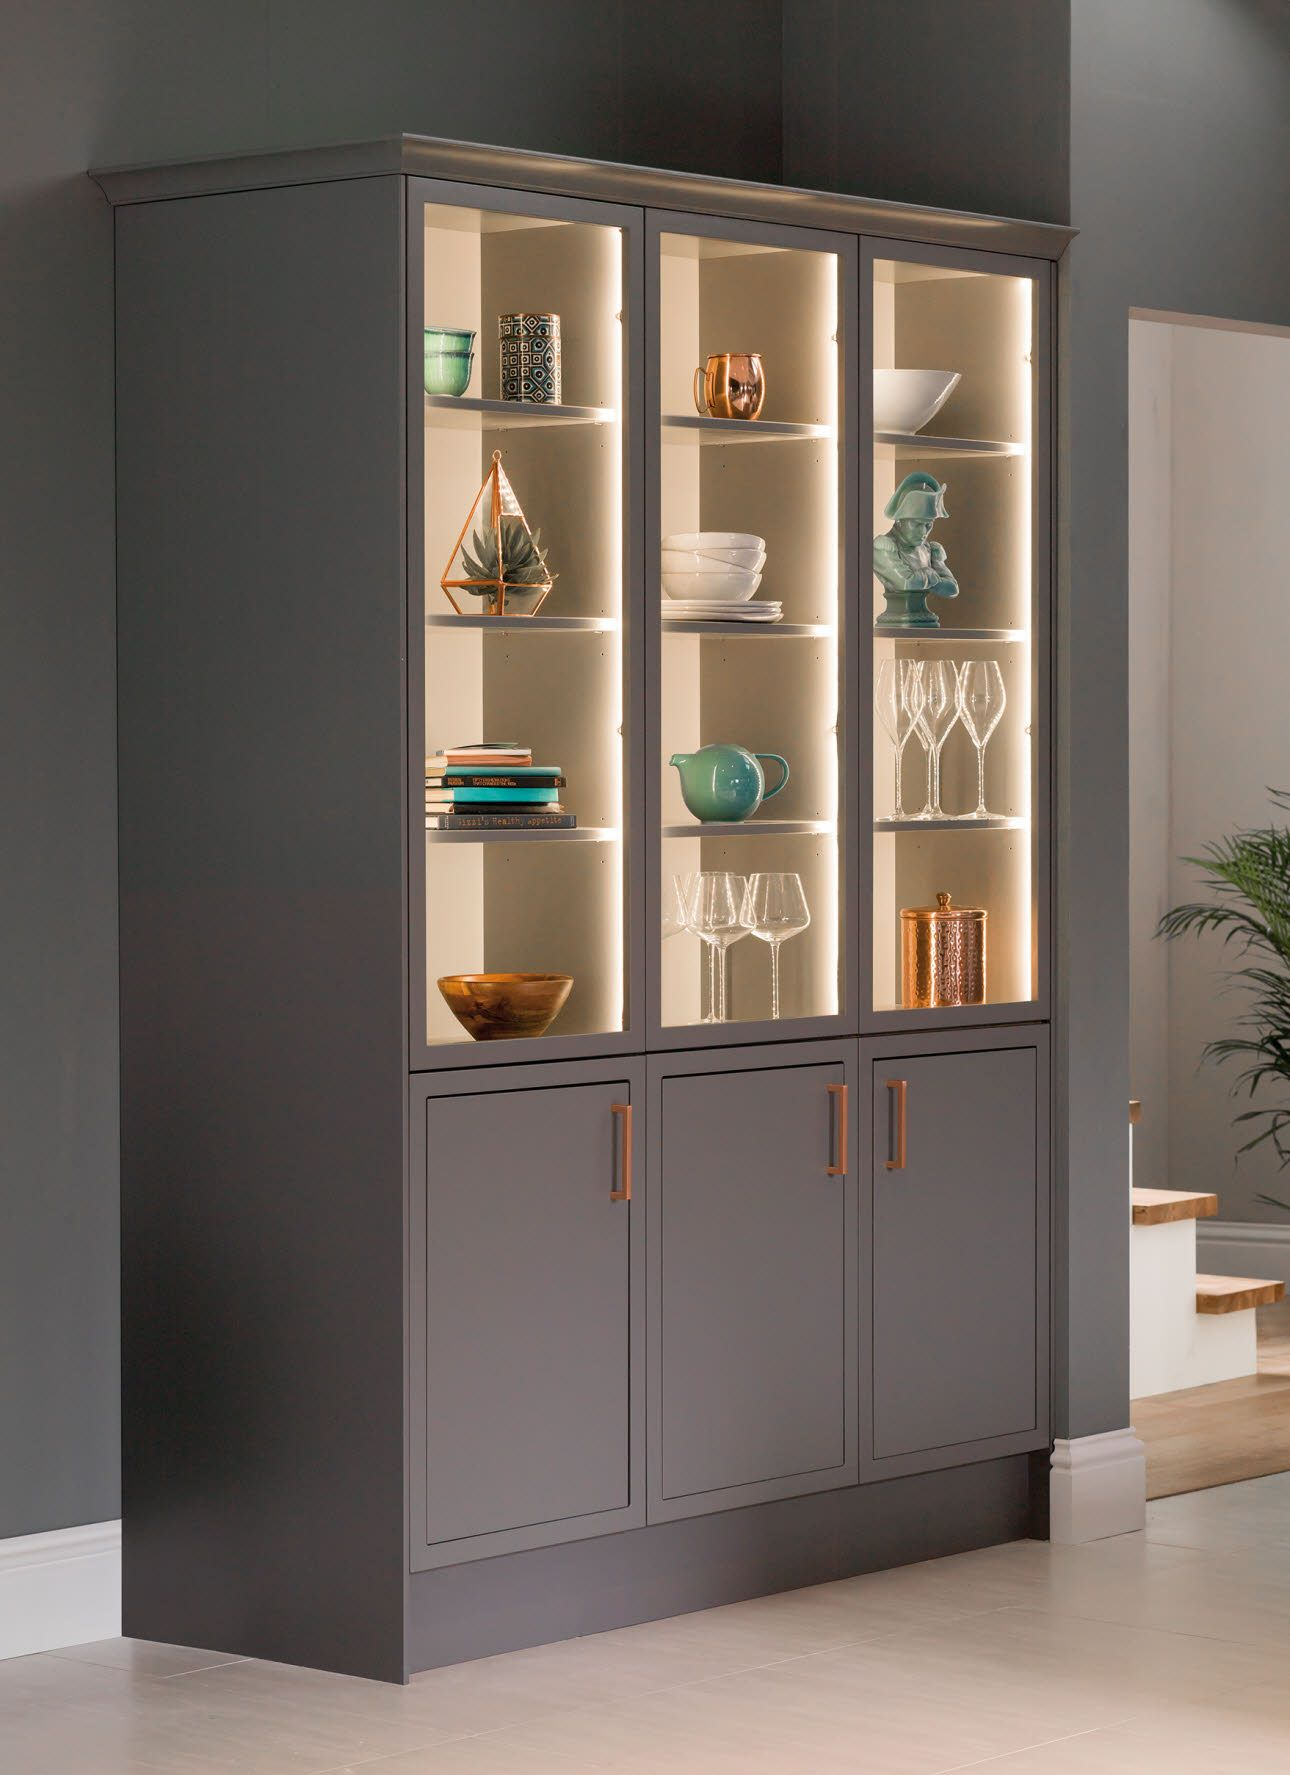 Newbury Grey | Crockery unit design, Crockery cabinet ...